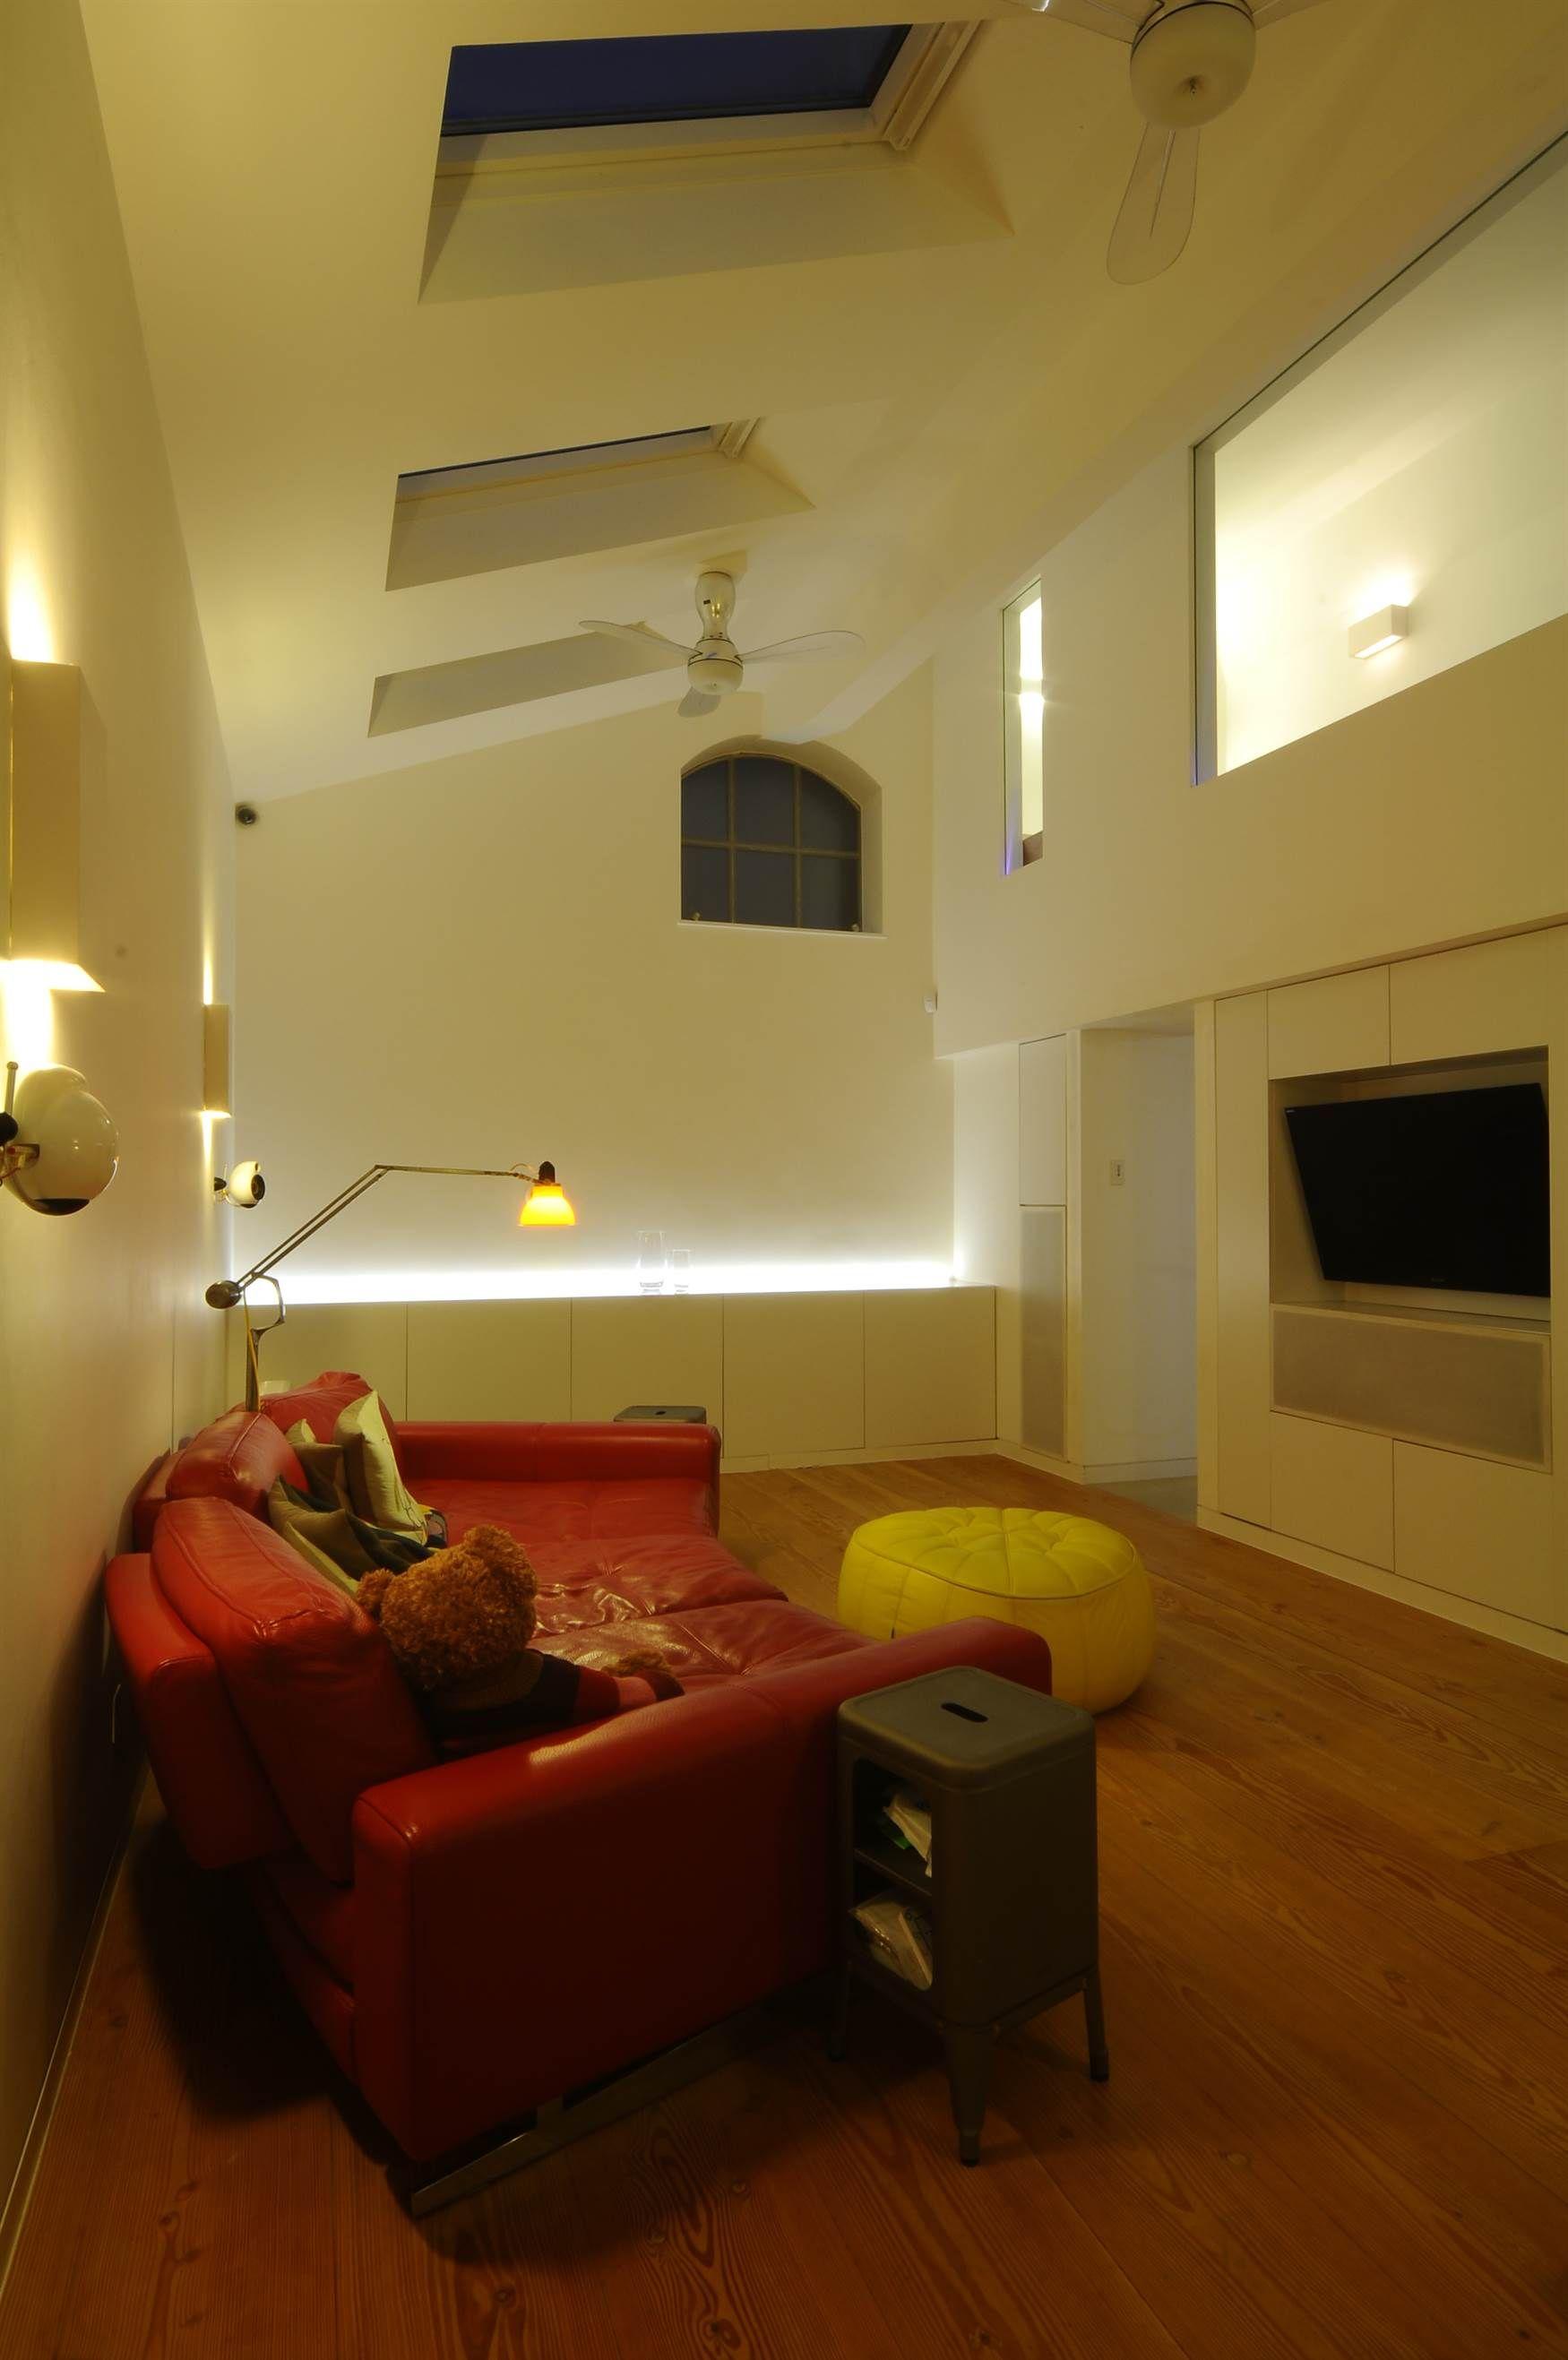 Living room lighting design mr resistor plaster wall lights and led living room lighting design mr resistor plaster wall lights and led tape aloadofball Gallery